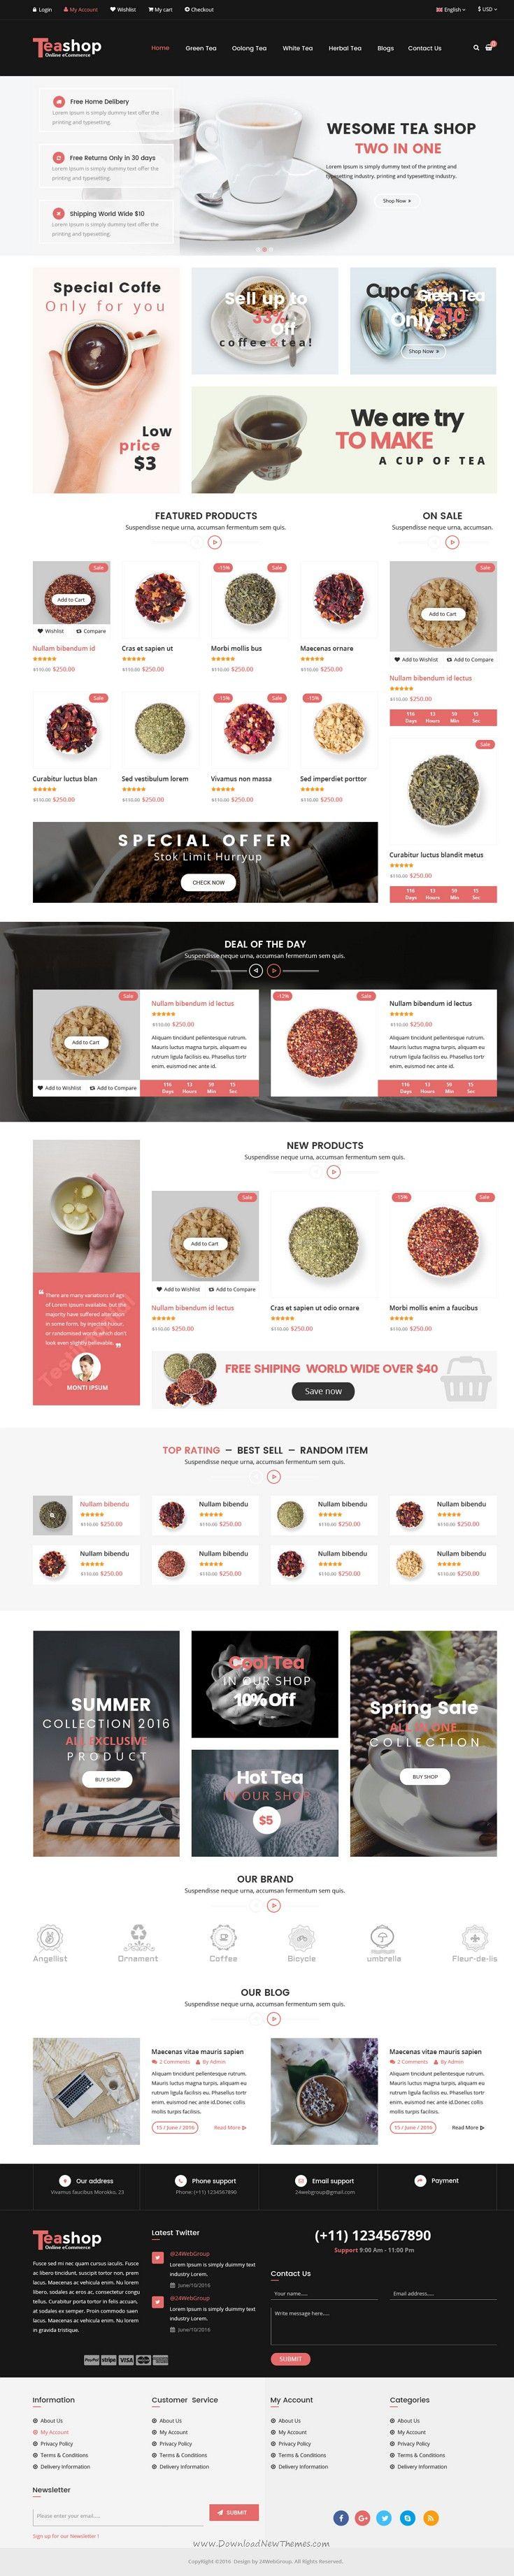 TeaShop is wonderful premium PSD Template for multipurpose eCommerce website. #tea #coffee #shop Download Now!